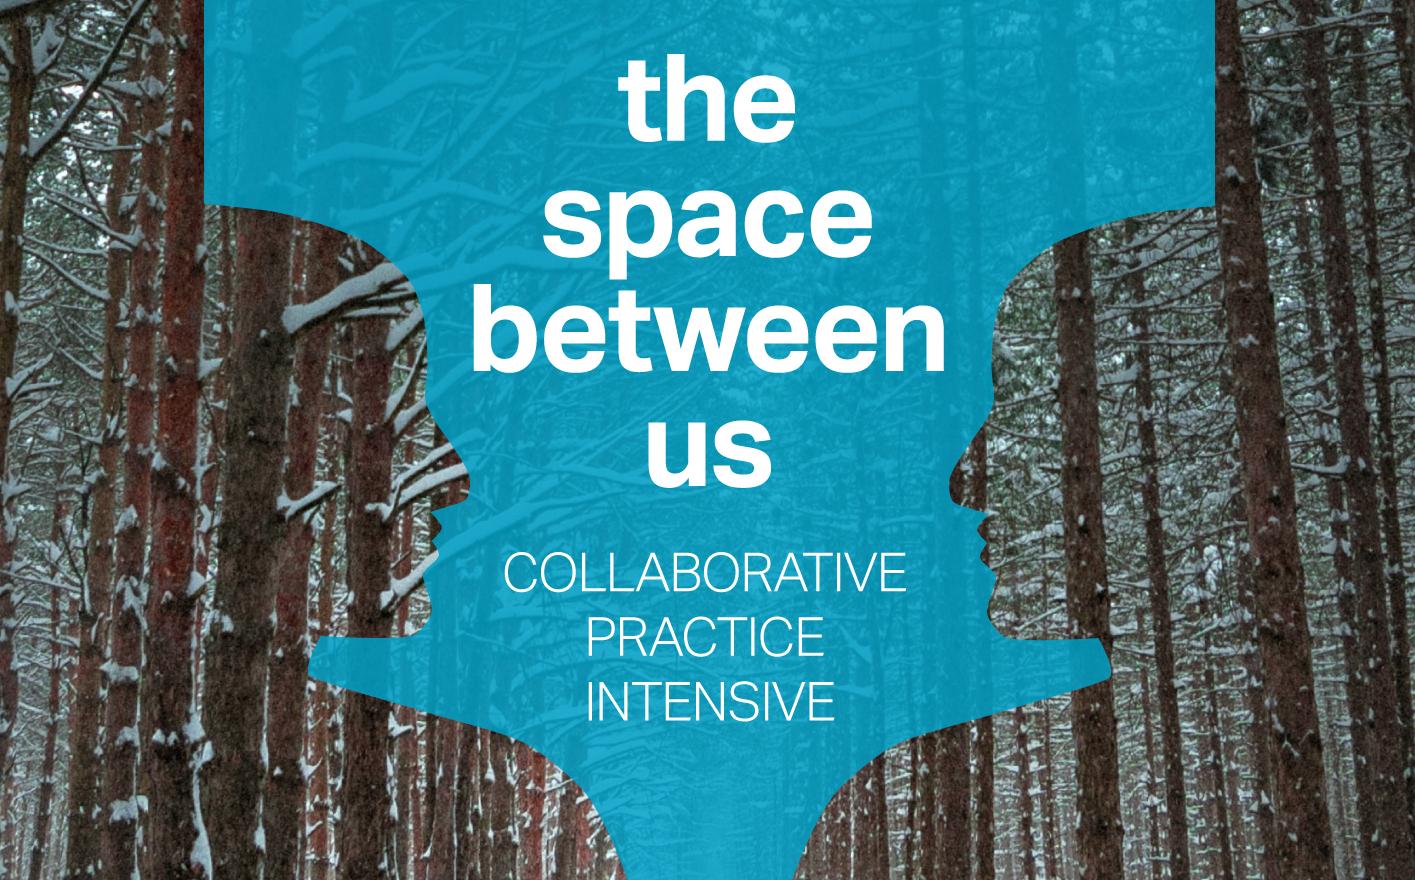 The Space Between Us Collaborative Practice Intensive - 7-10 December 2018Montreal, Quebec